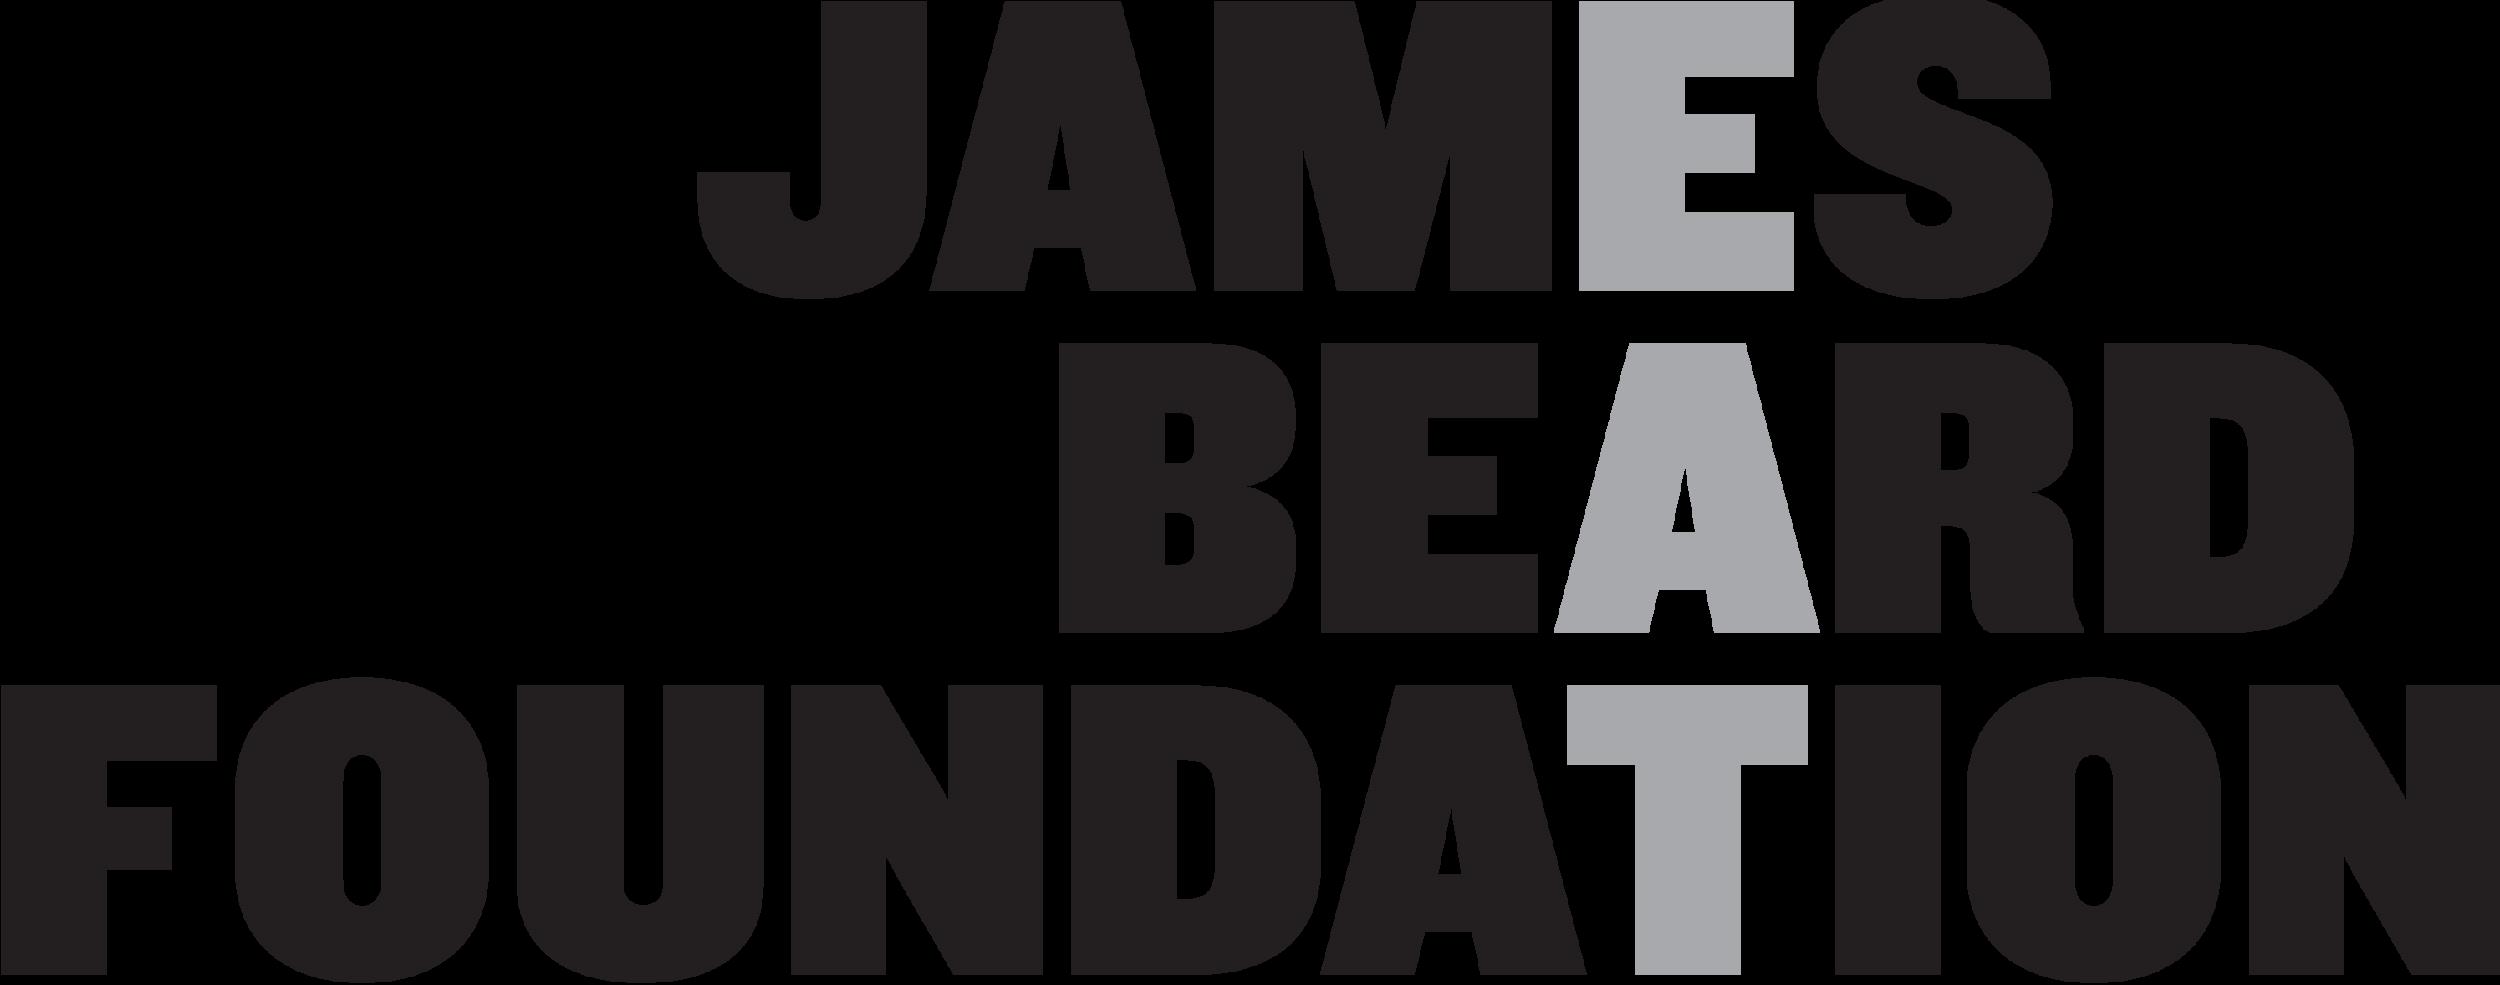 Member - James Beard Foundation